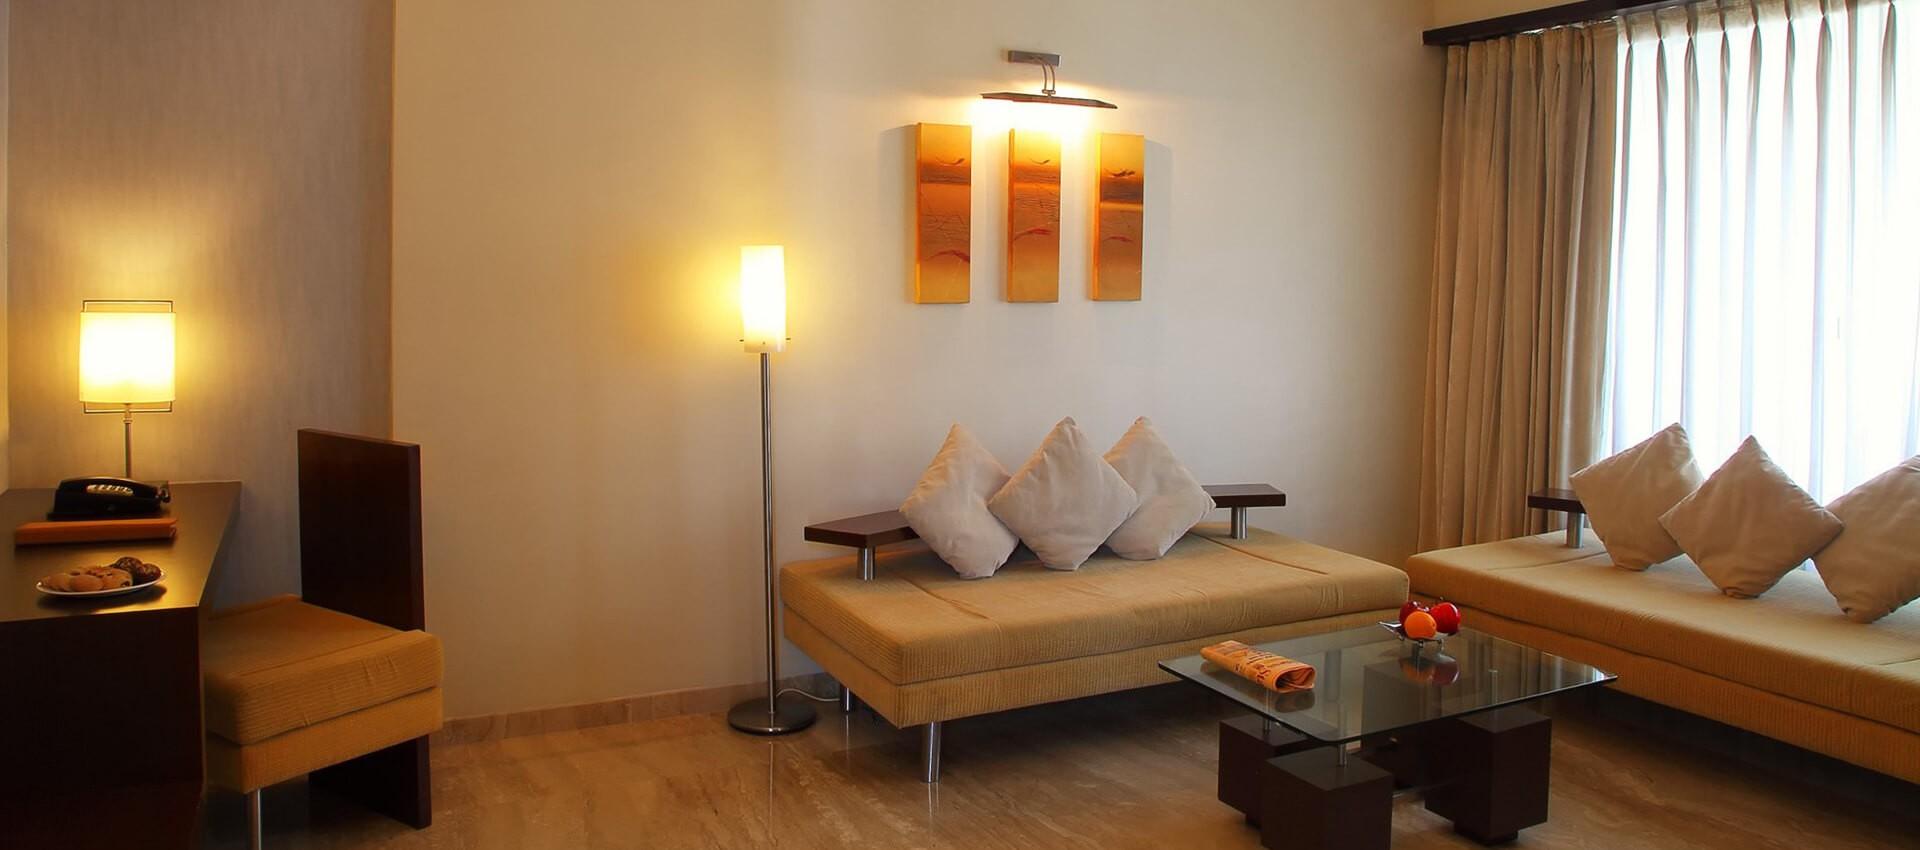 Facilities - The Mirador Hotel